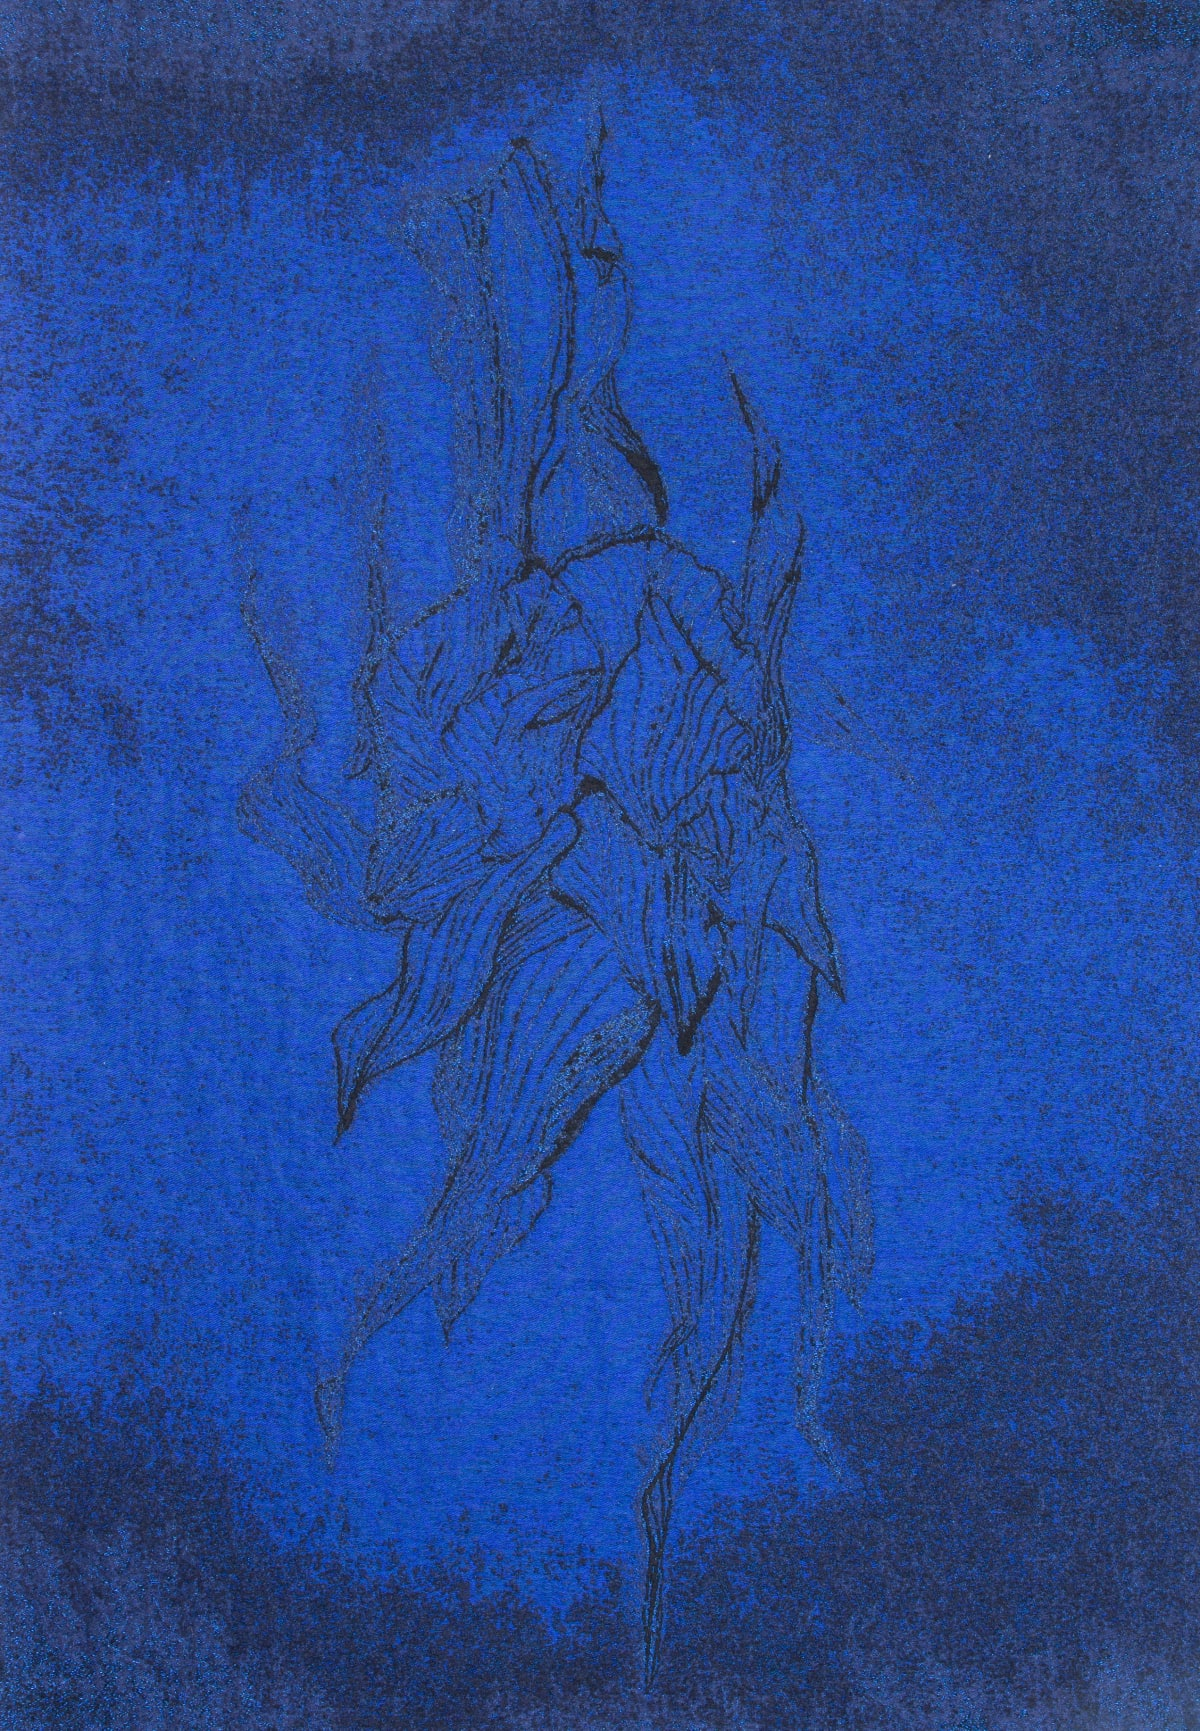 Jan Koen Lomans, Nocturne V